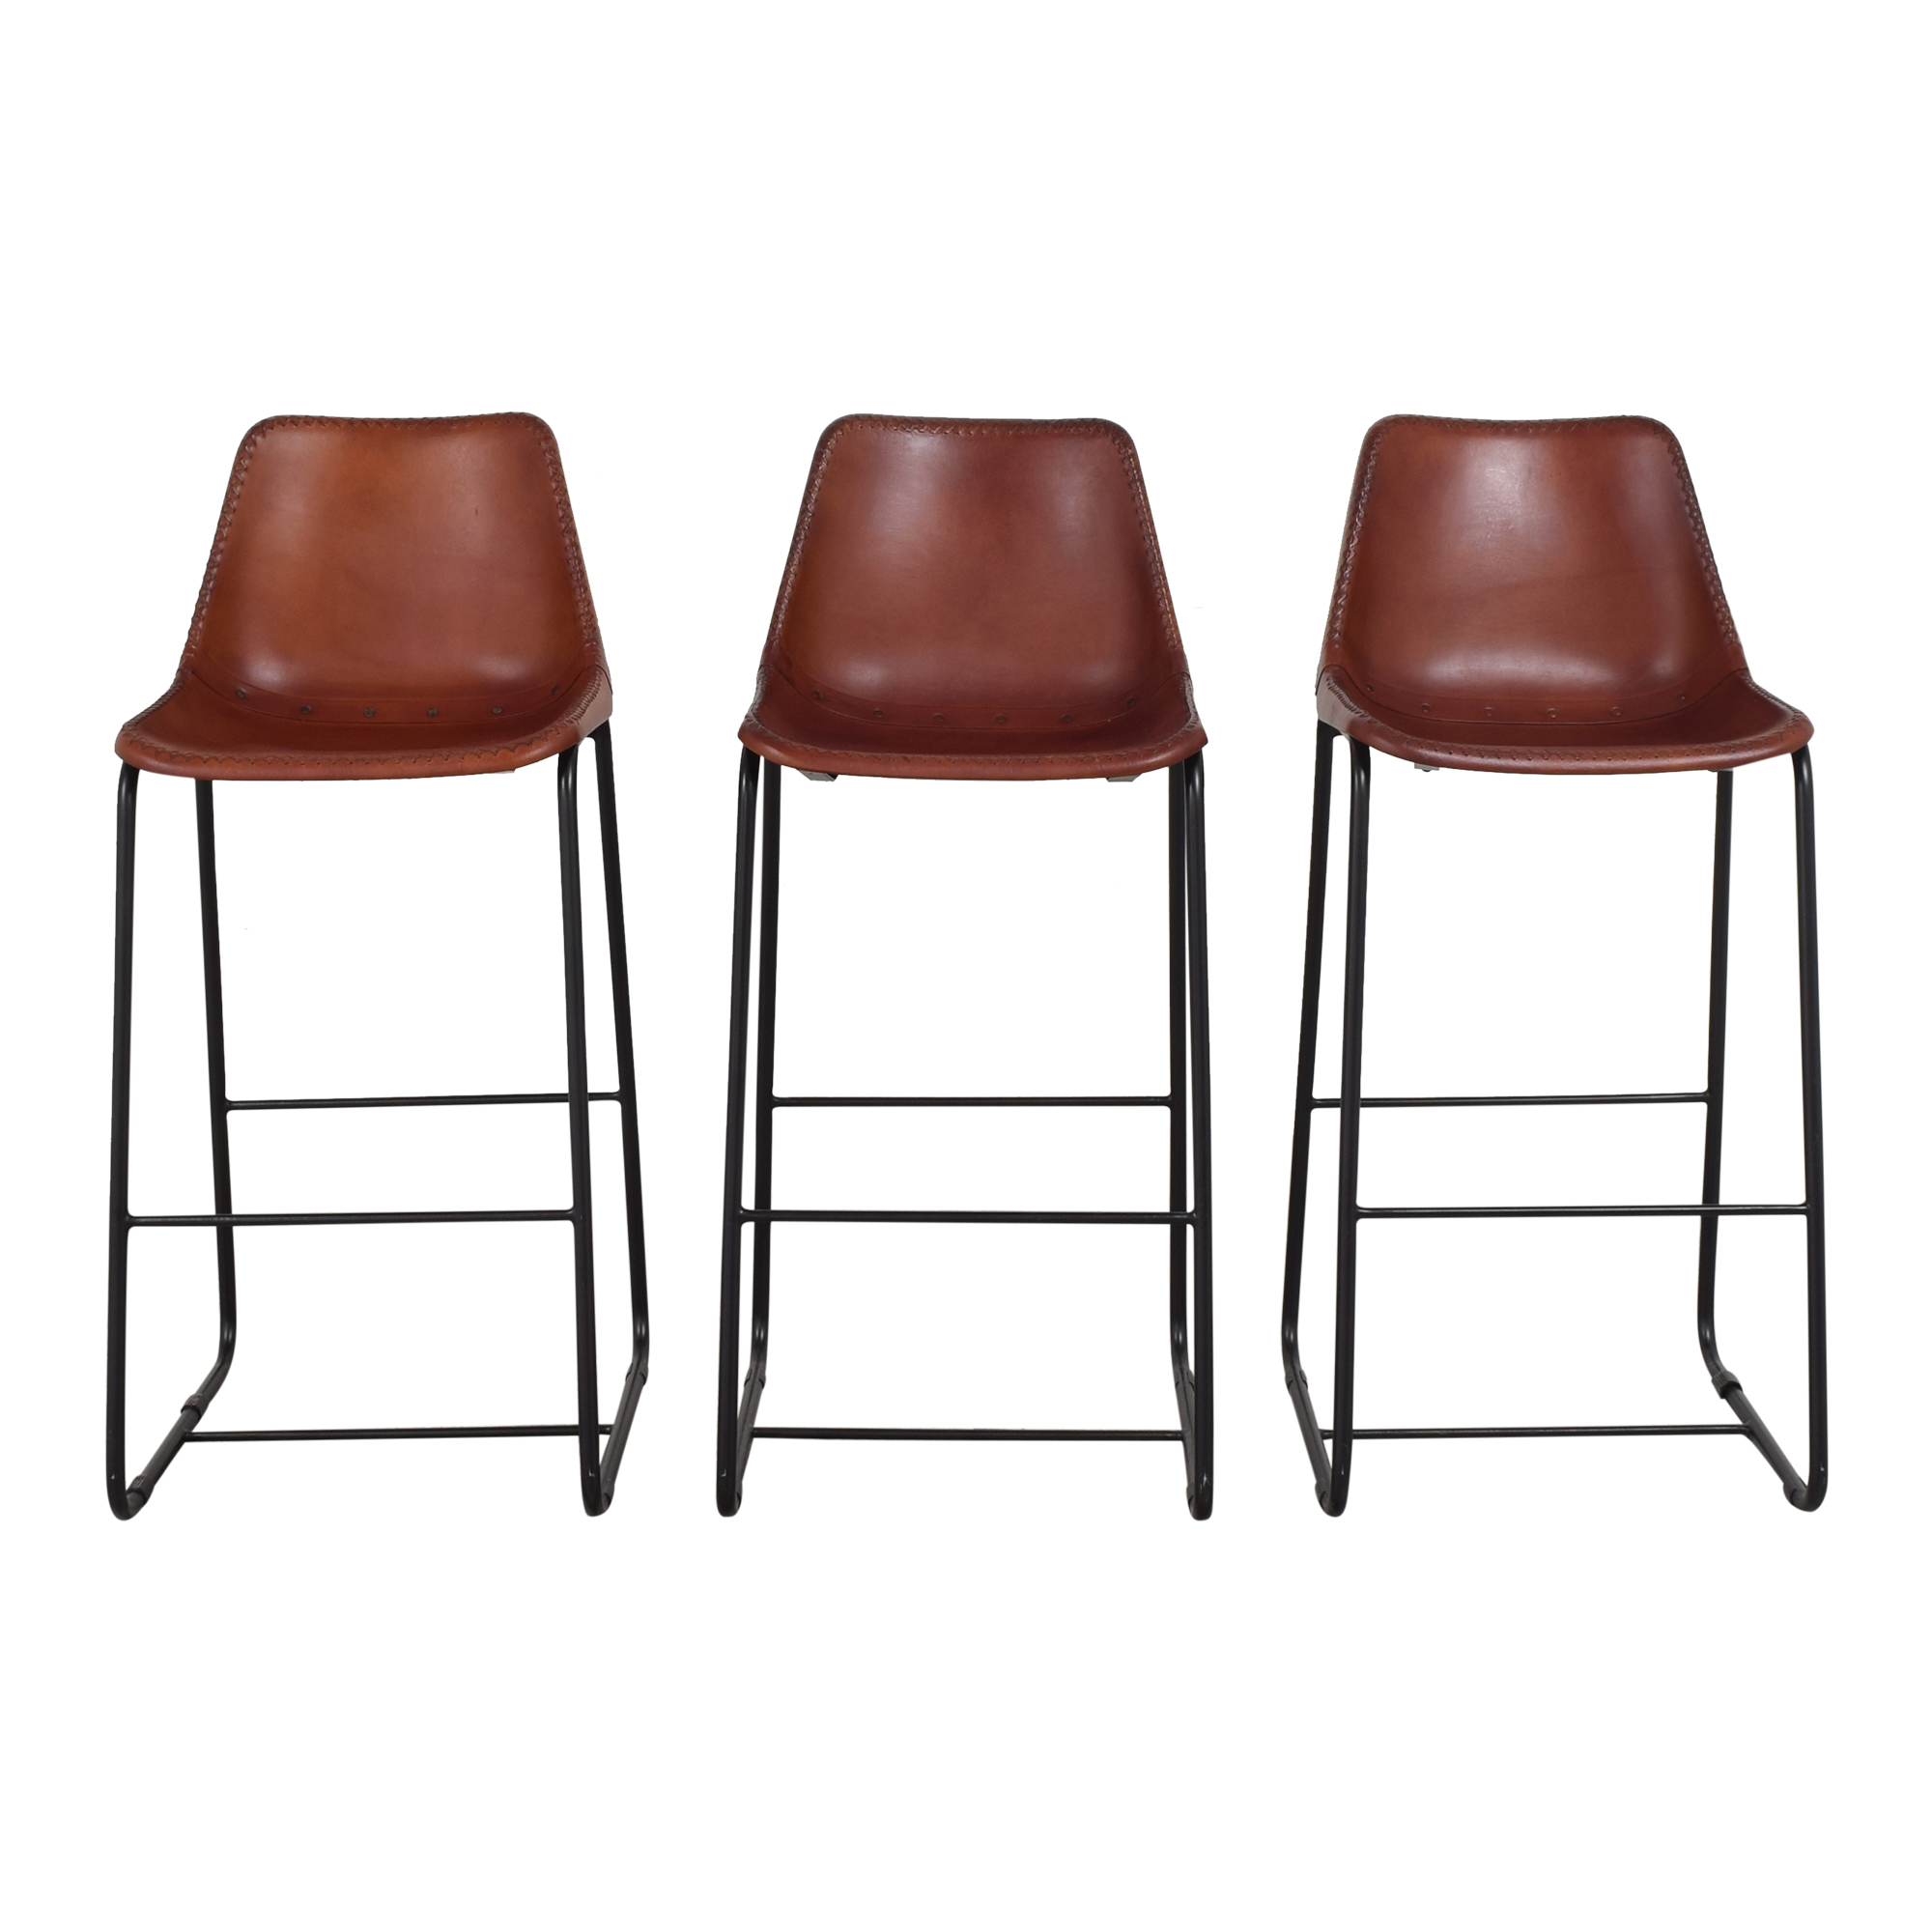 CB2 Roadhouse Bar Stools / Chairs